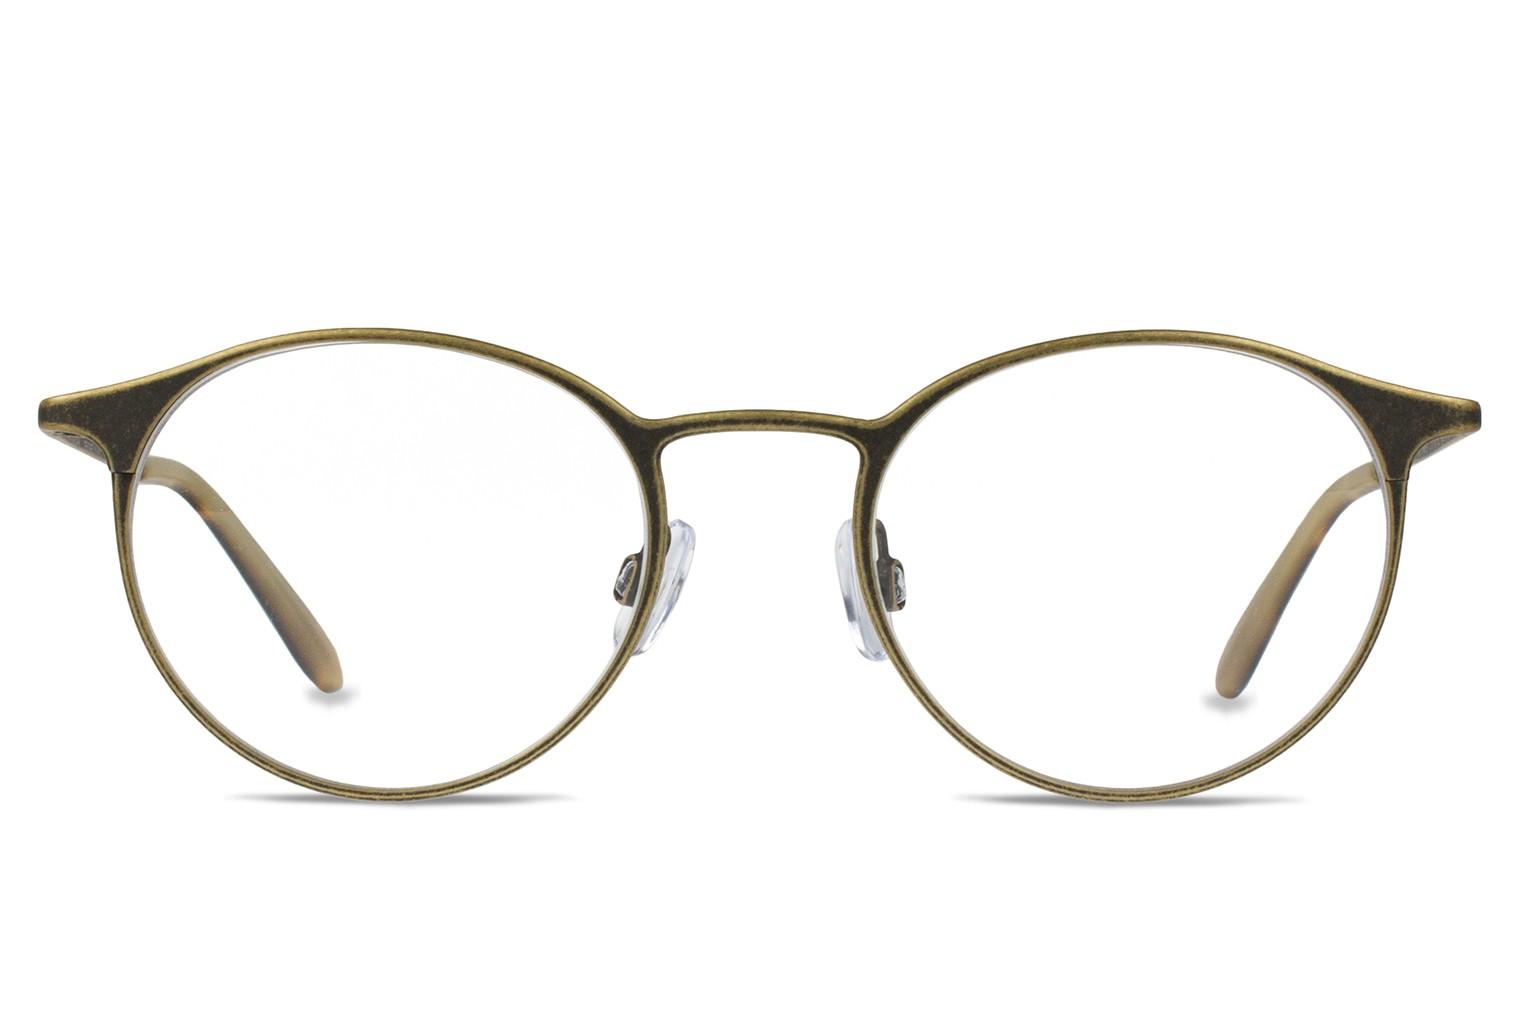 Glasses Frames Plastic Vs Metal : 8 Geek Glasses That Will Get You That Bella Hadid Look